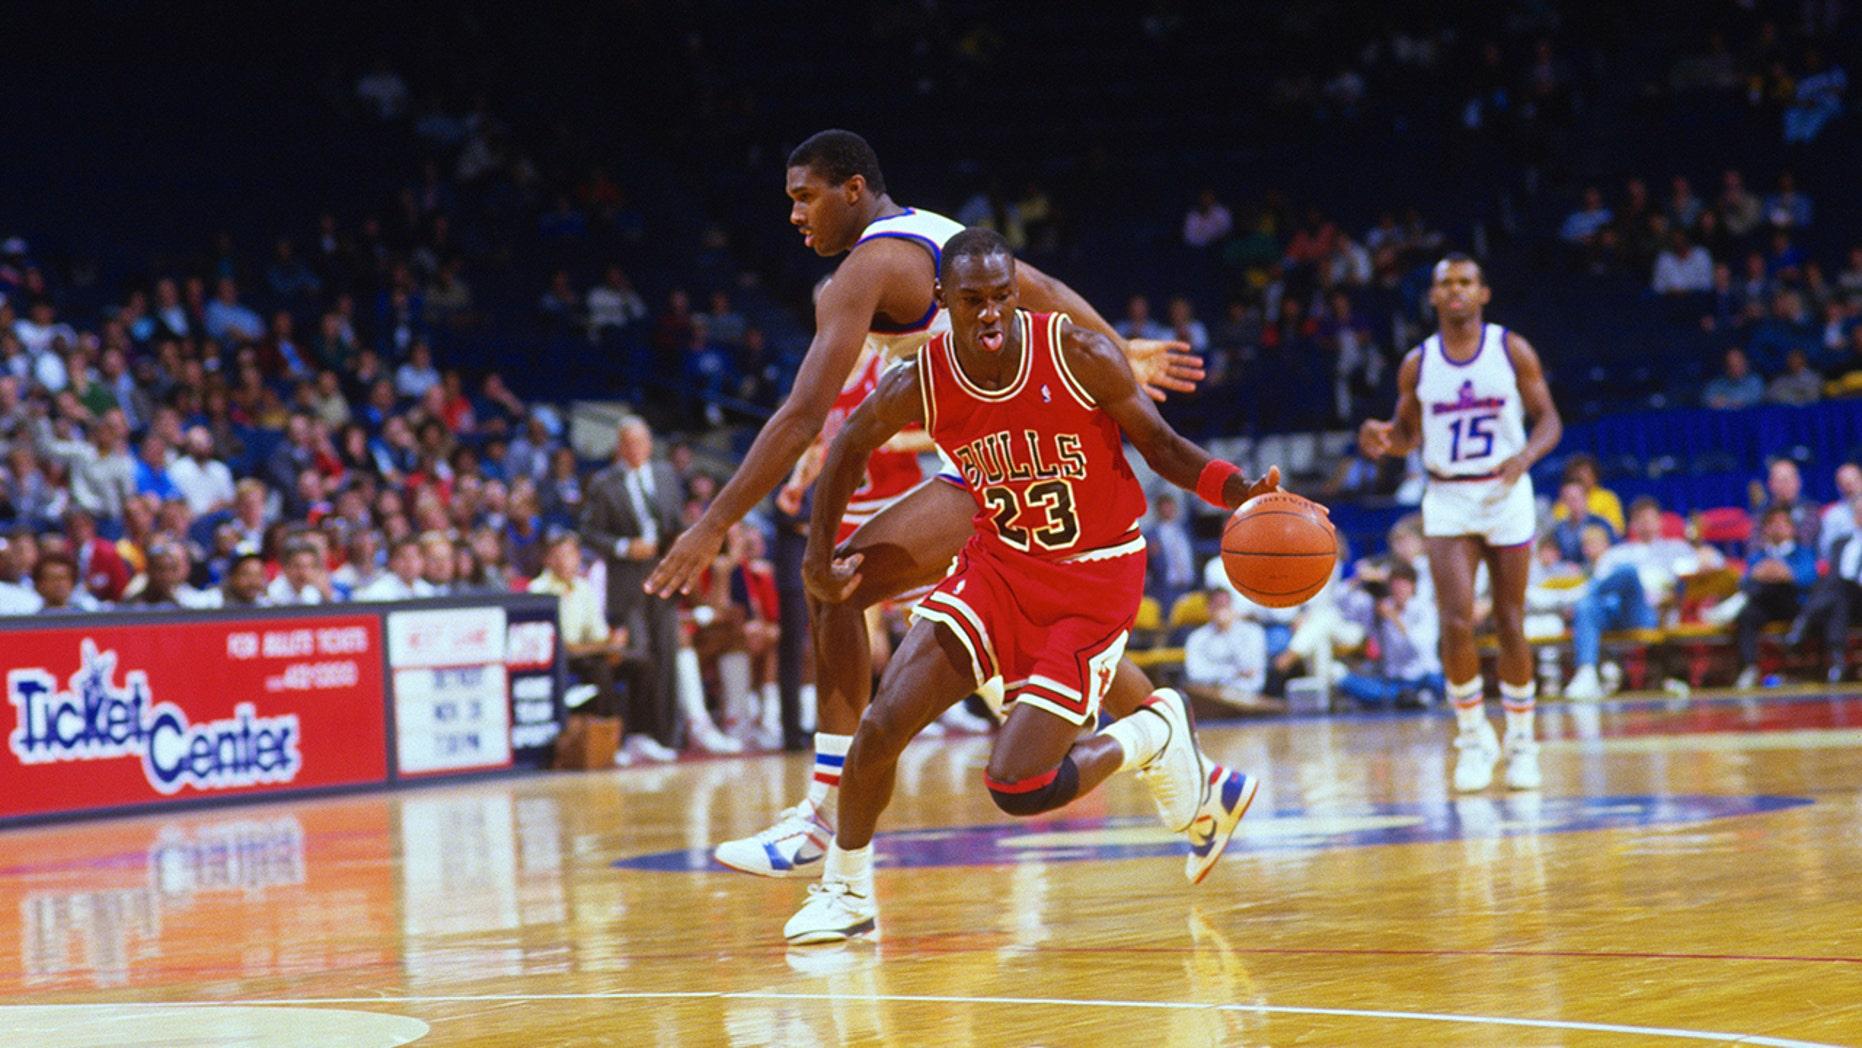 83e51c93786 A Michael Jordan fan got his famous number 23 jersey tattooed across his  entire upper body